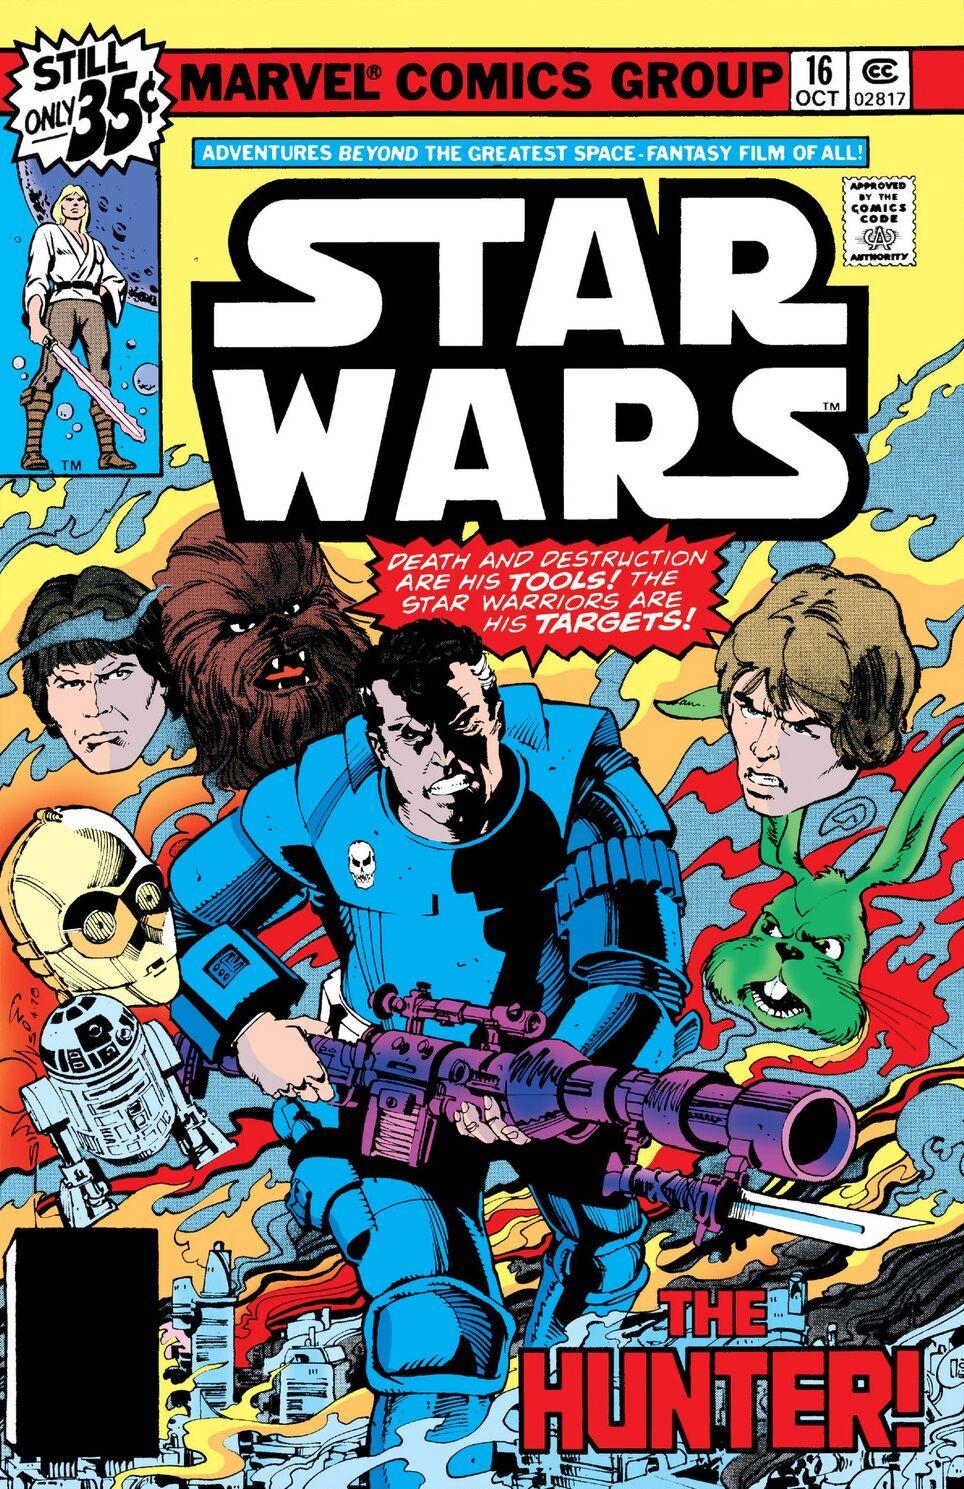 Star Wars: The Hunter